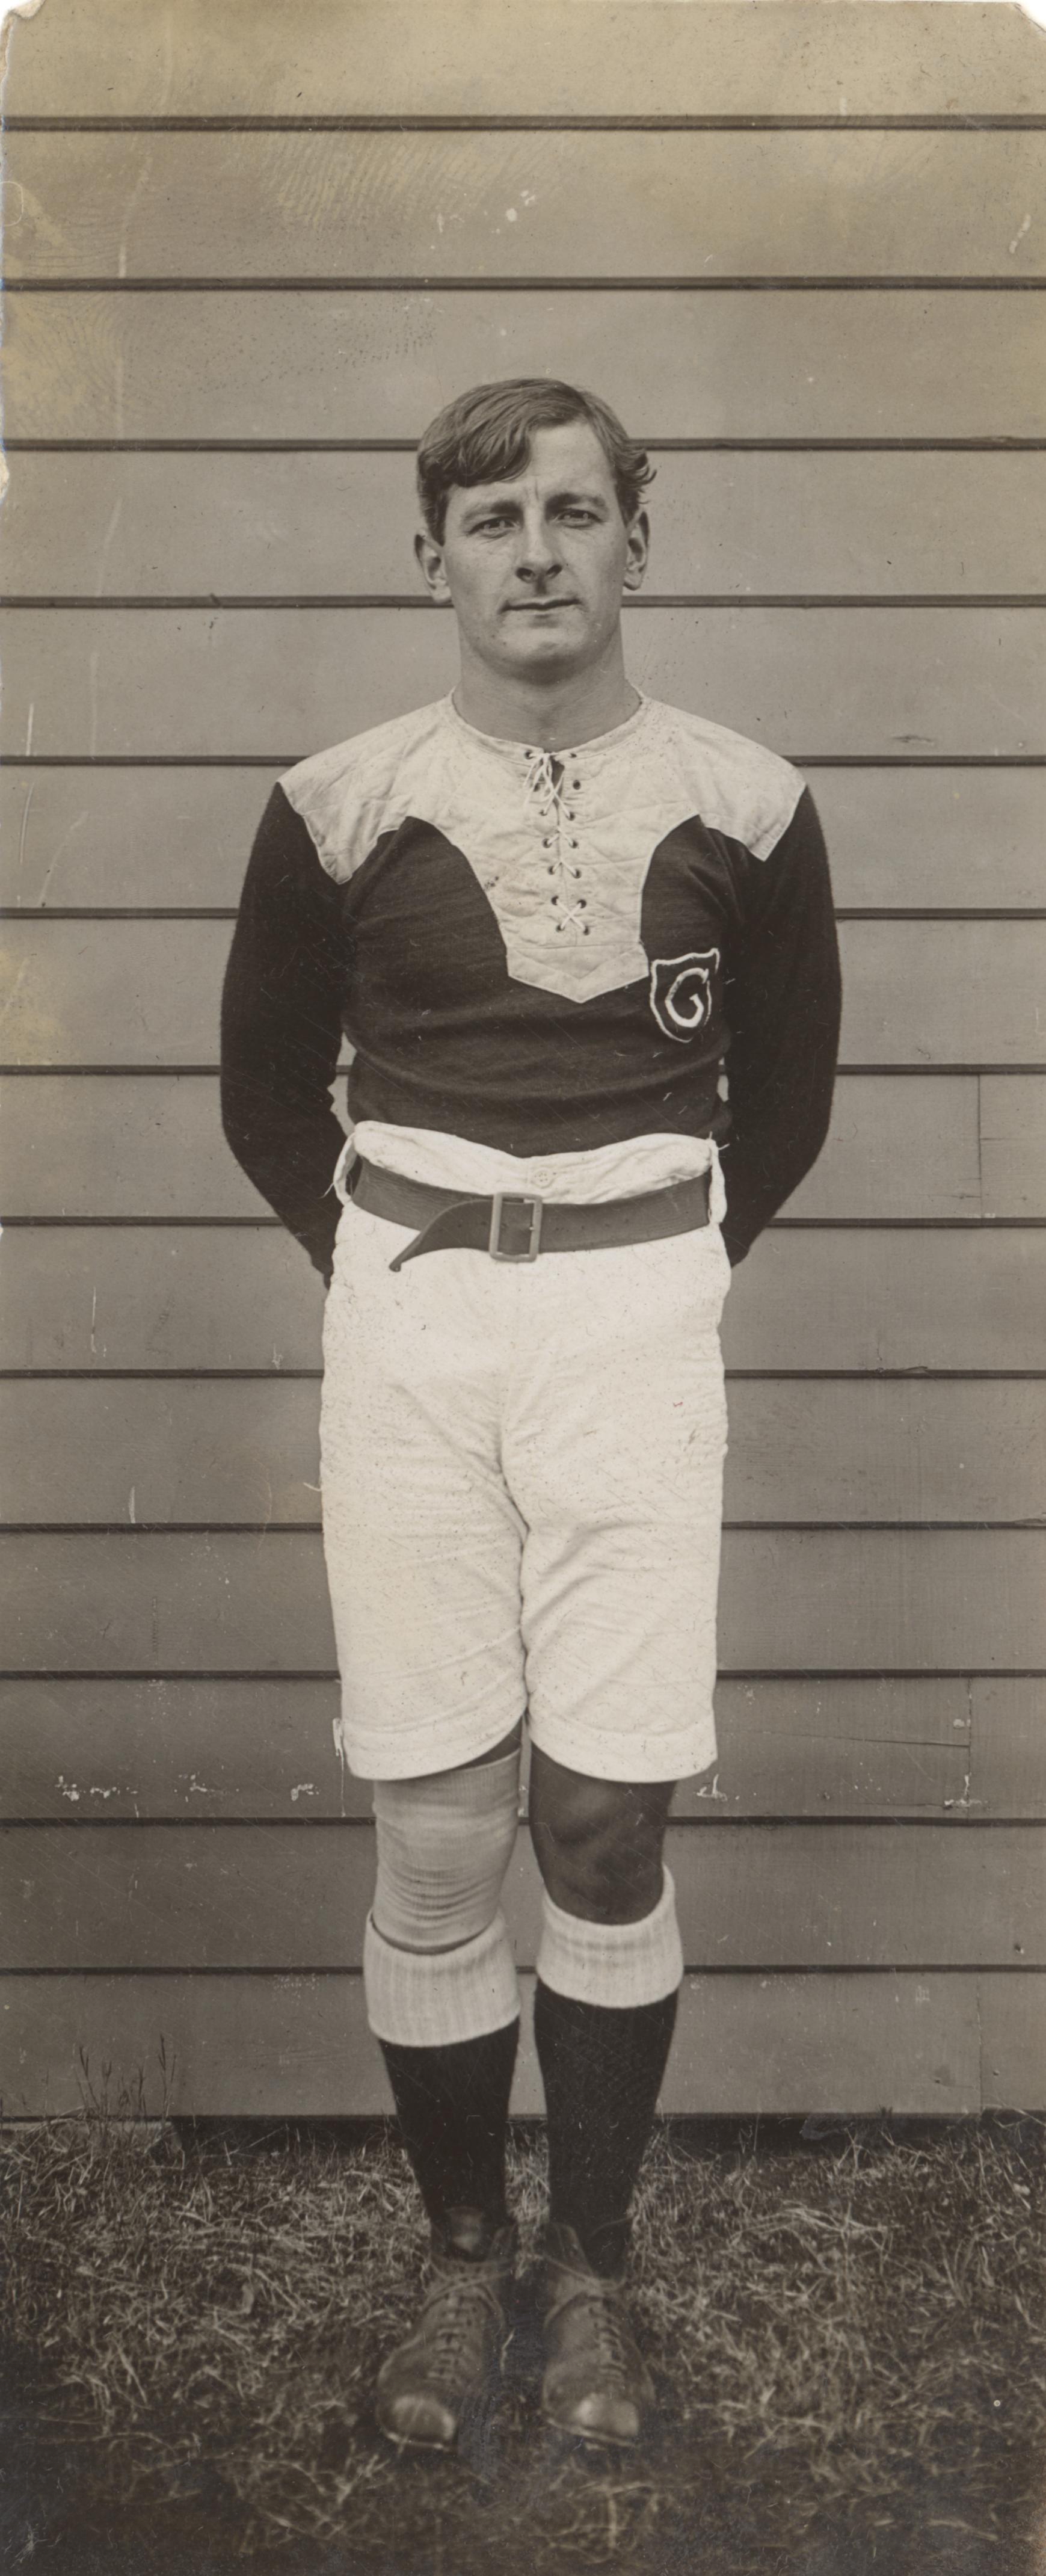 Ralgie, Glebe Rugby Union, Farnsworth Davis sporting collection part II